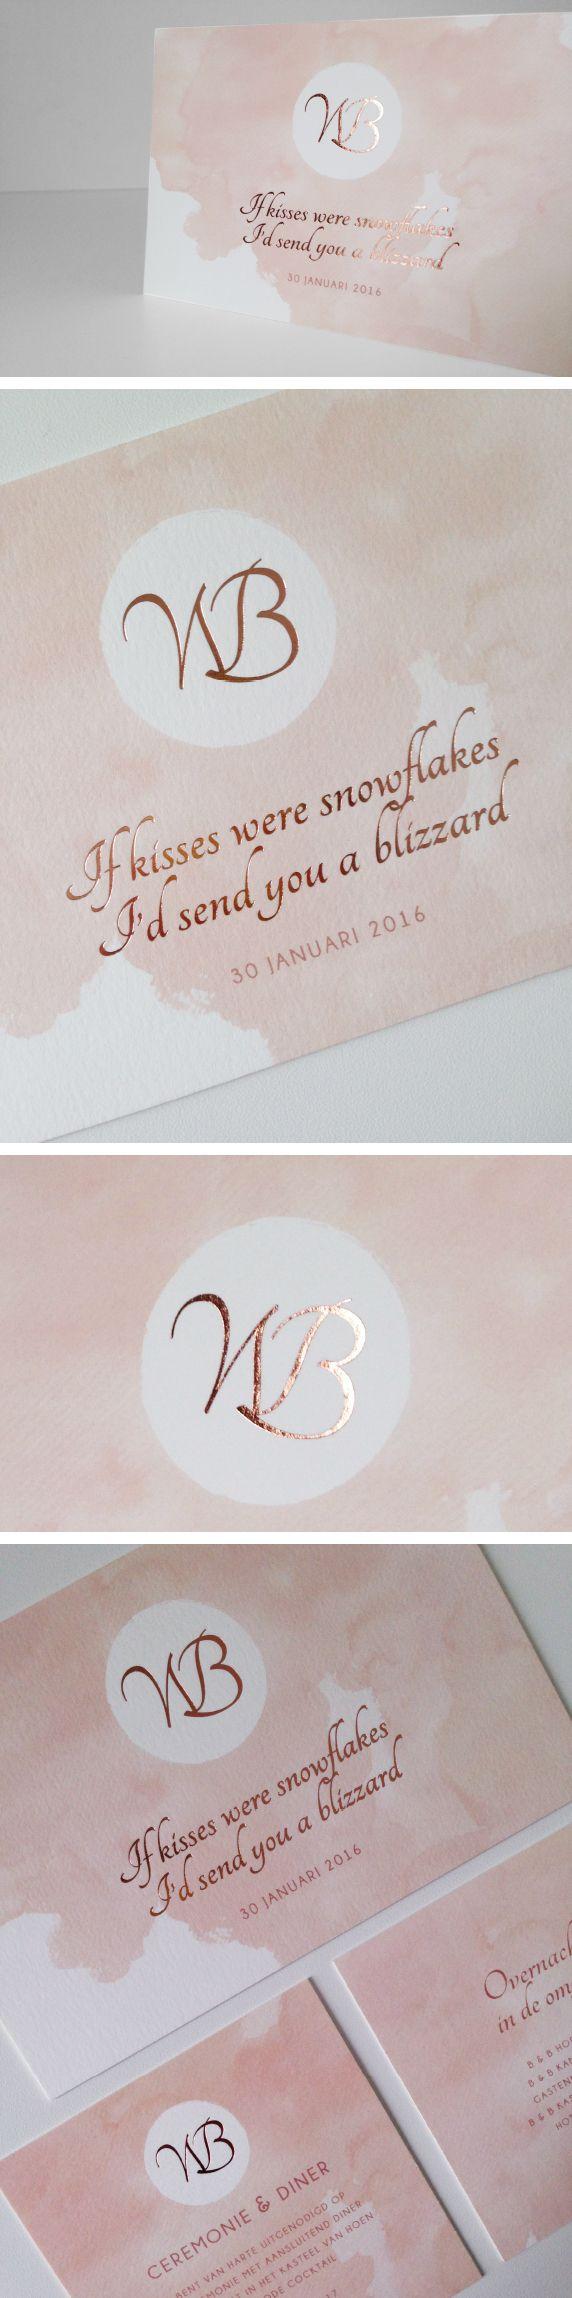 koperfolie, aquarelle, initialen, copper foil wedding invitation trouwuitnodiging watercolor paint roos verf